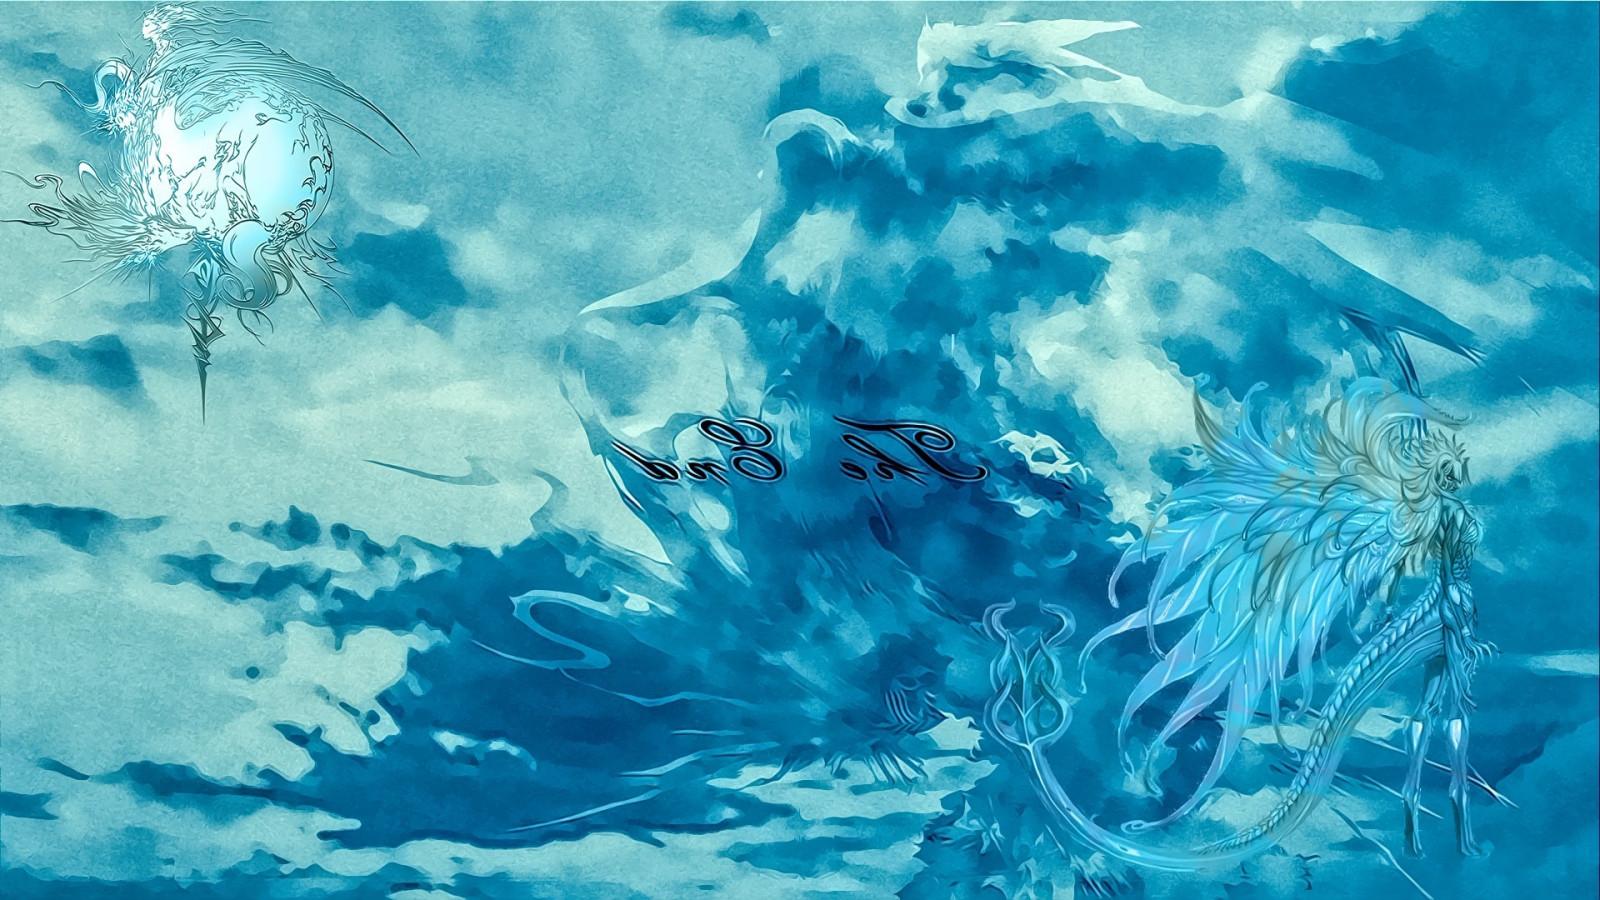 Japanese Wave Wallpaper Hd Wallpaper Illustration Sea Blue Underwater Final